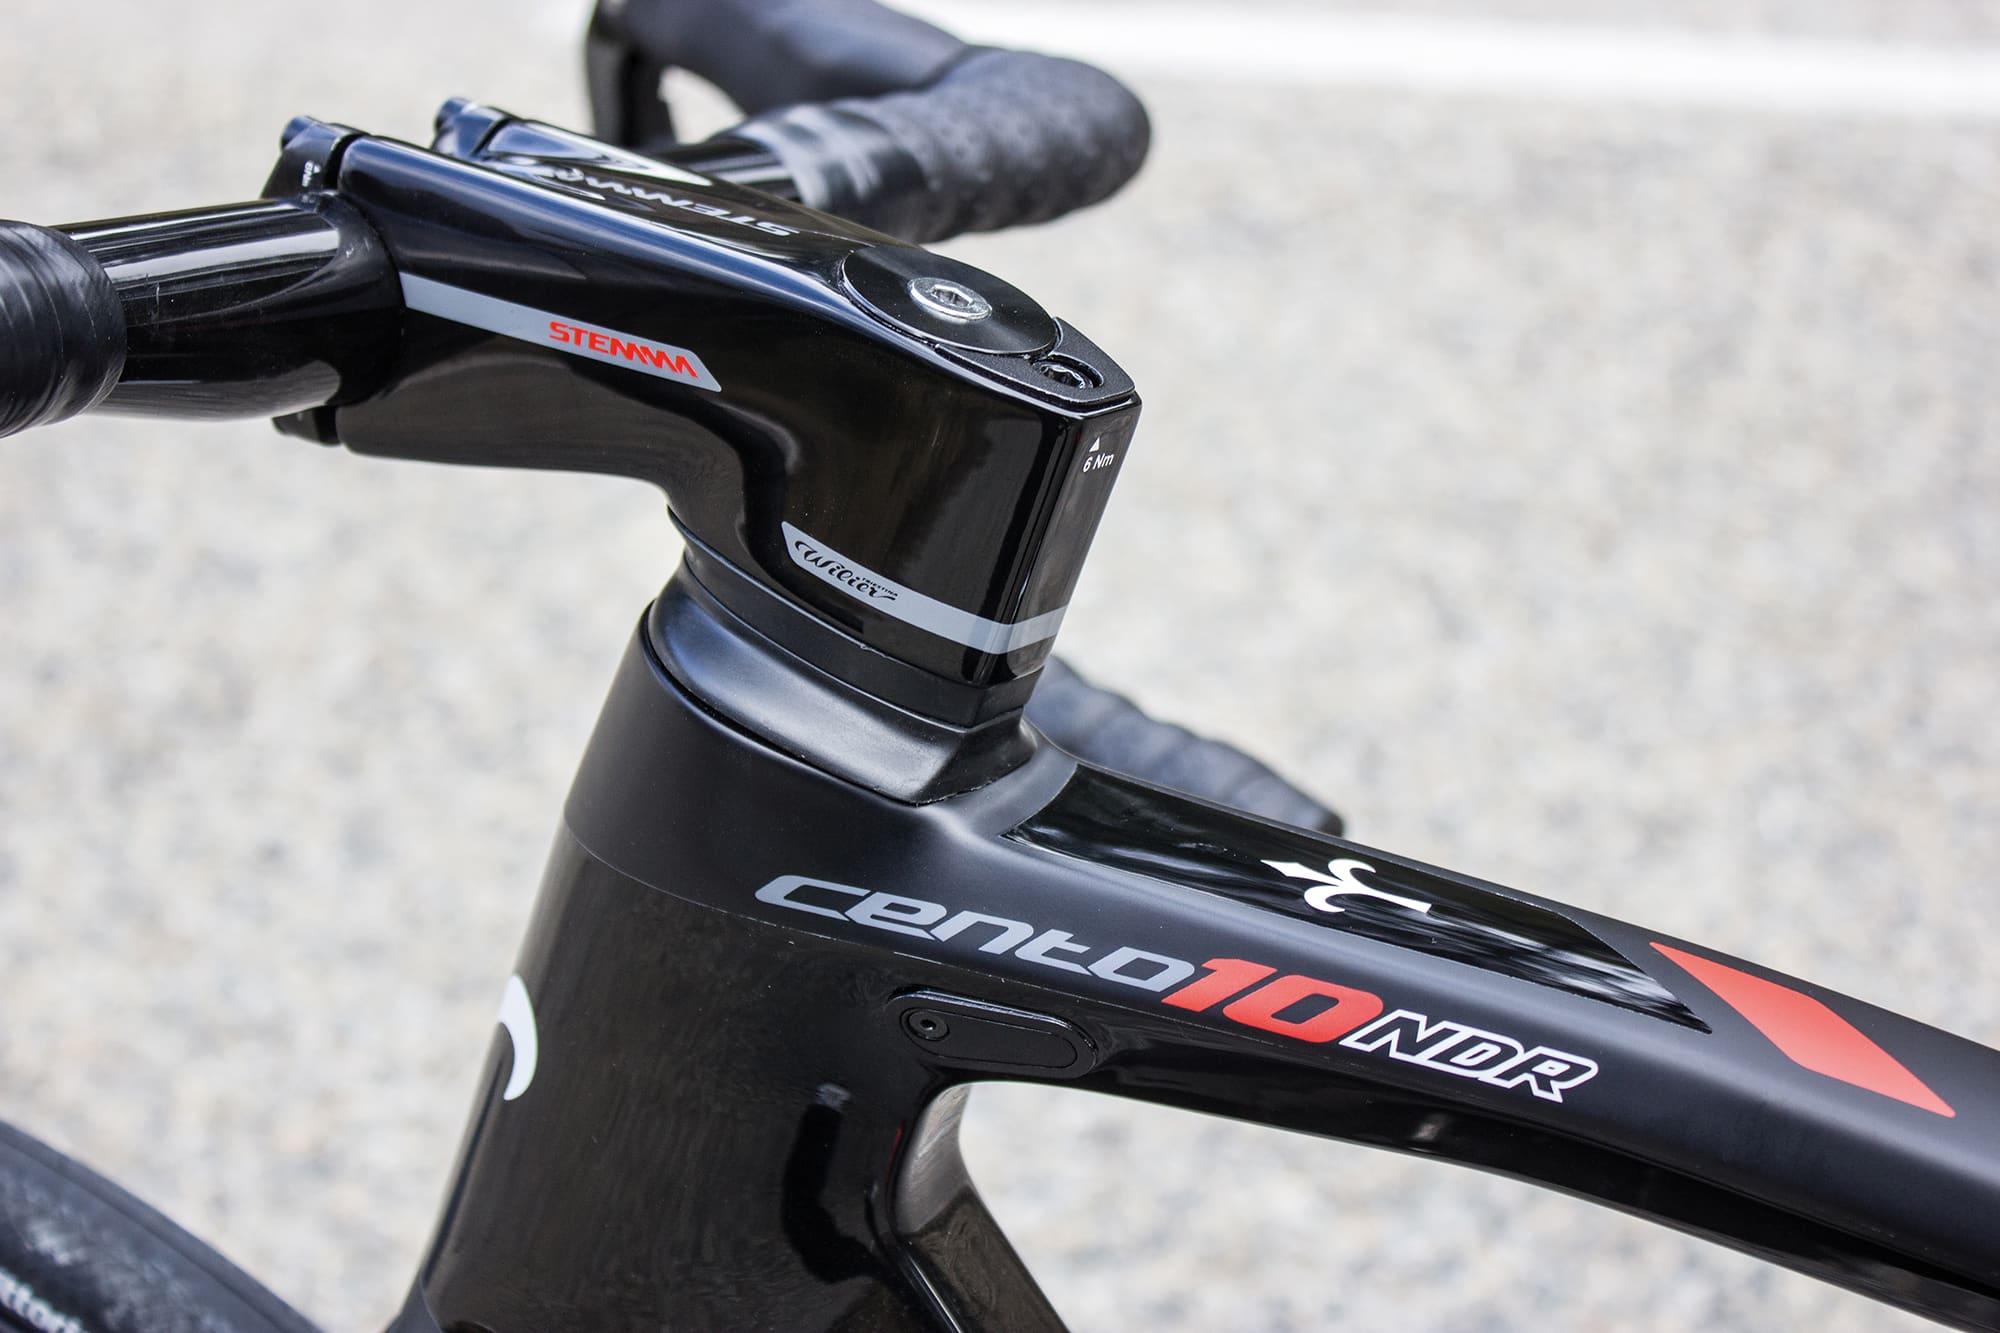 Wilier Zero.6 contre Wilier Cento 10 NDR – Deux vélos à 10 000 euros !